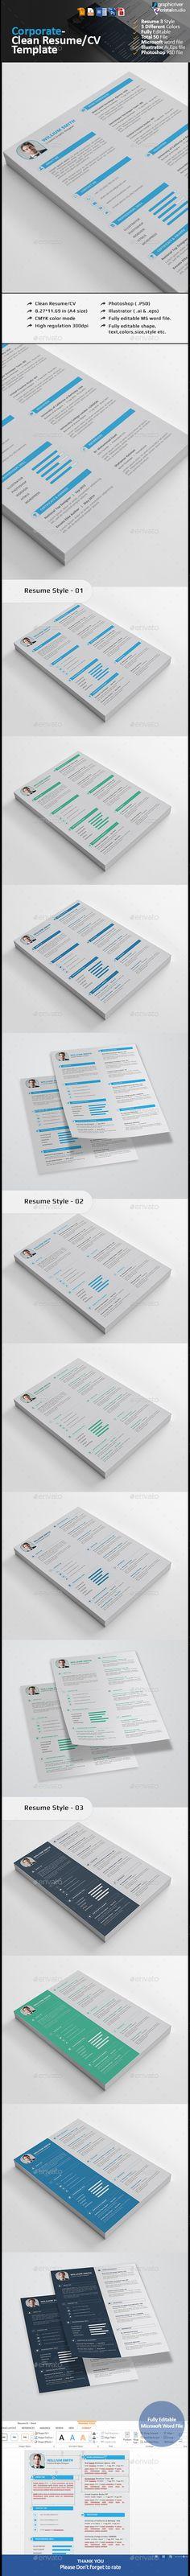 Resume Set Stationery and Resume - killer resume